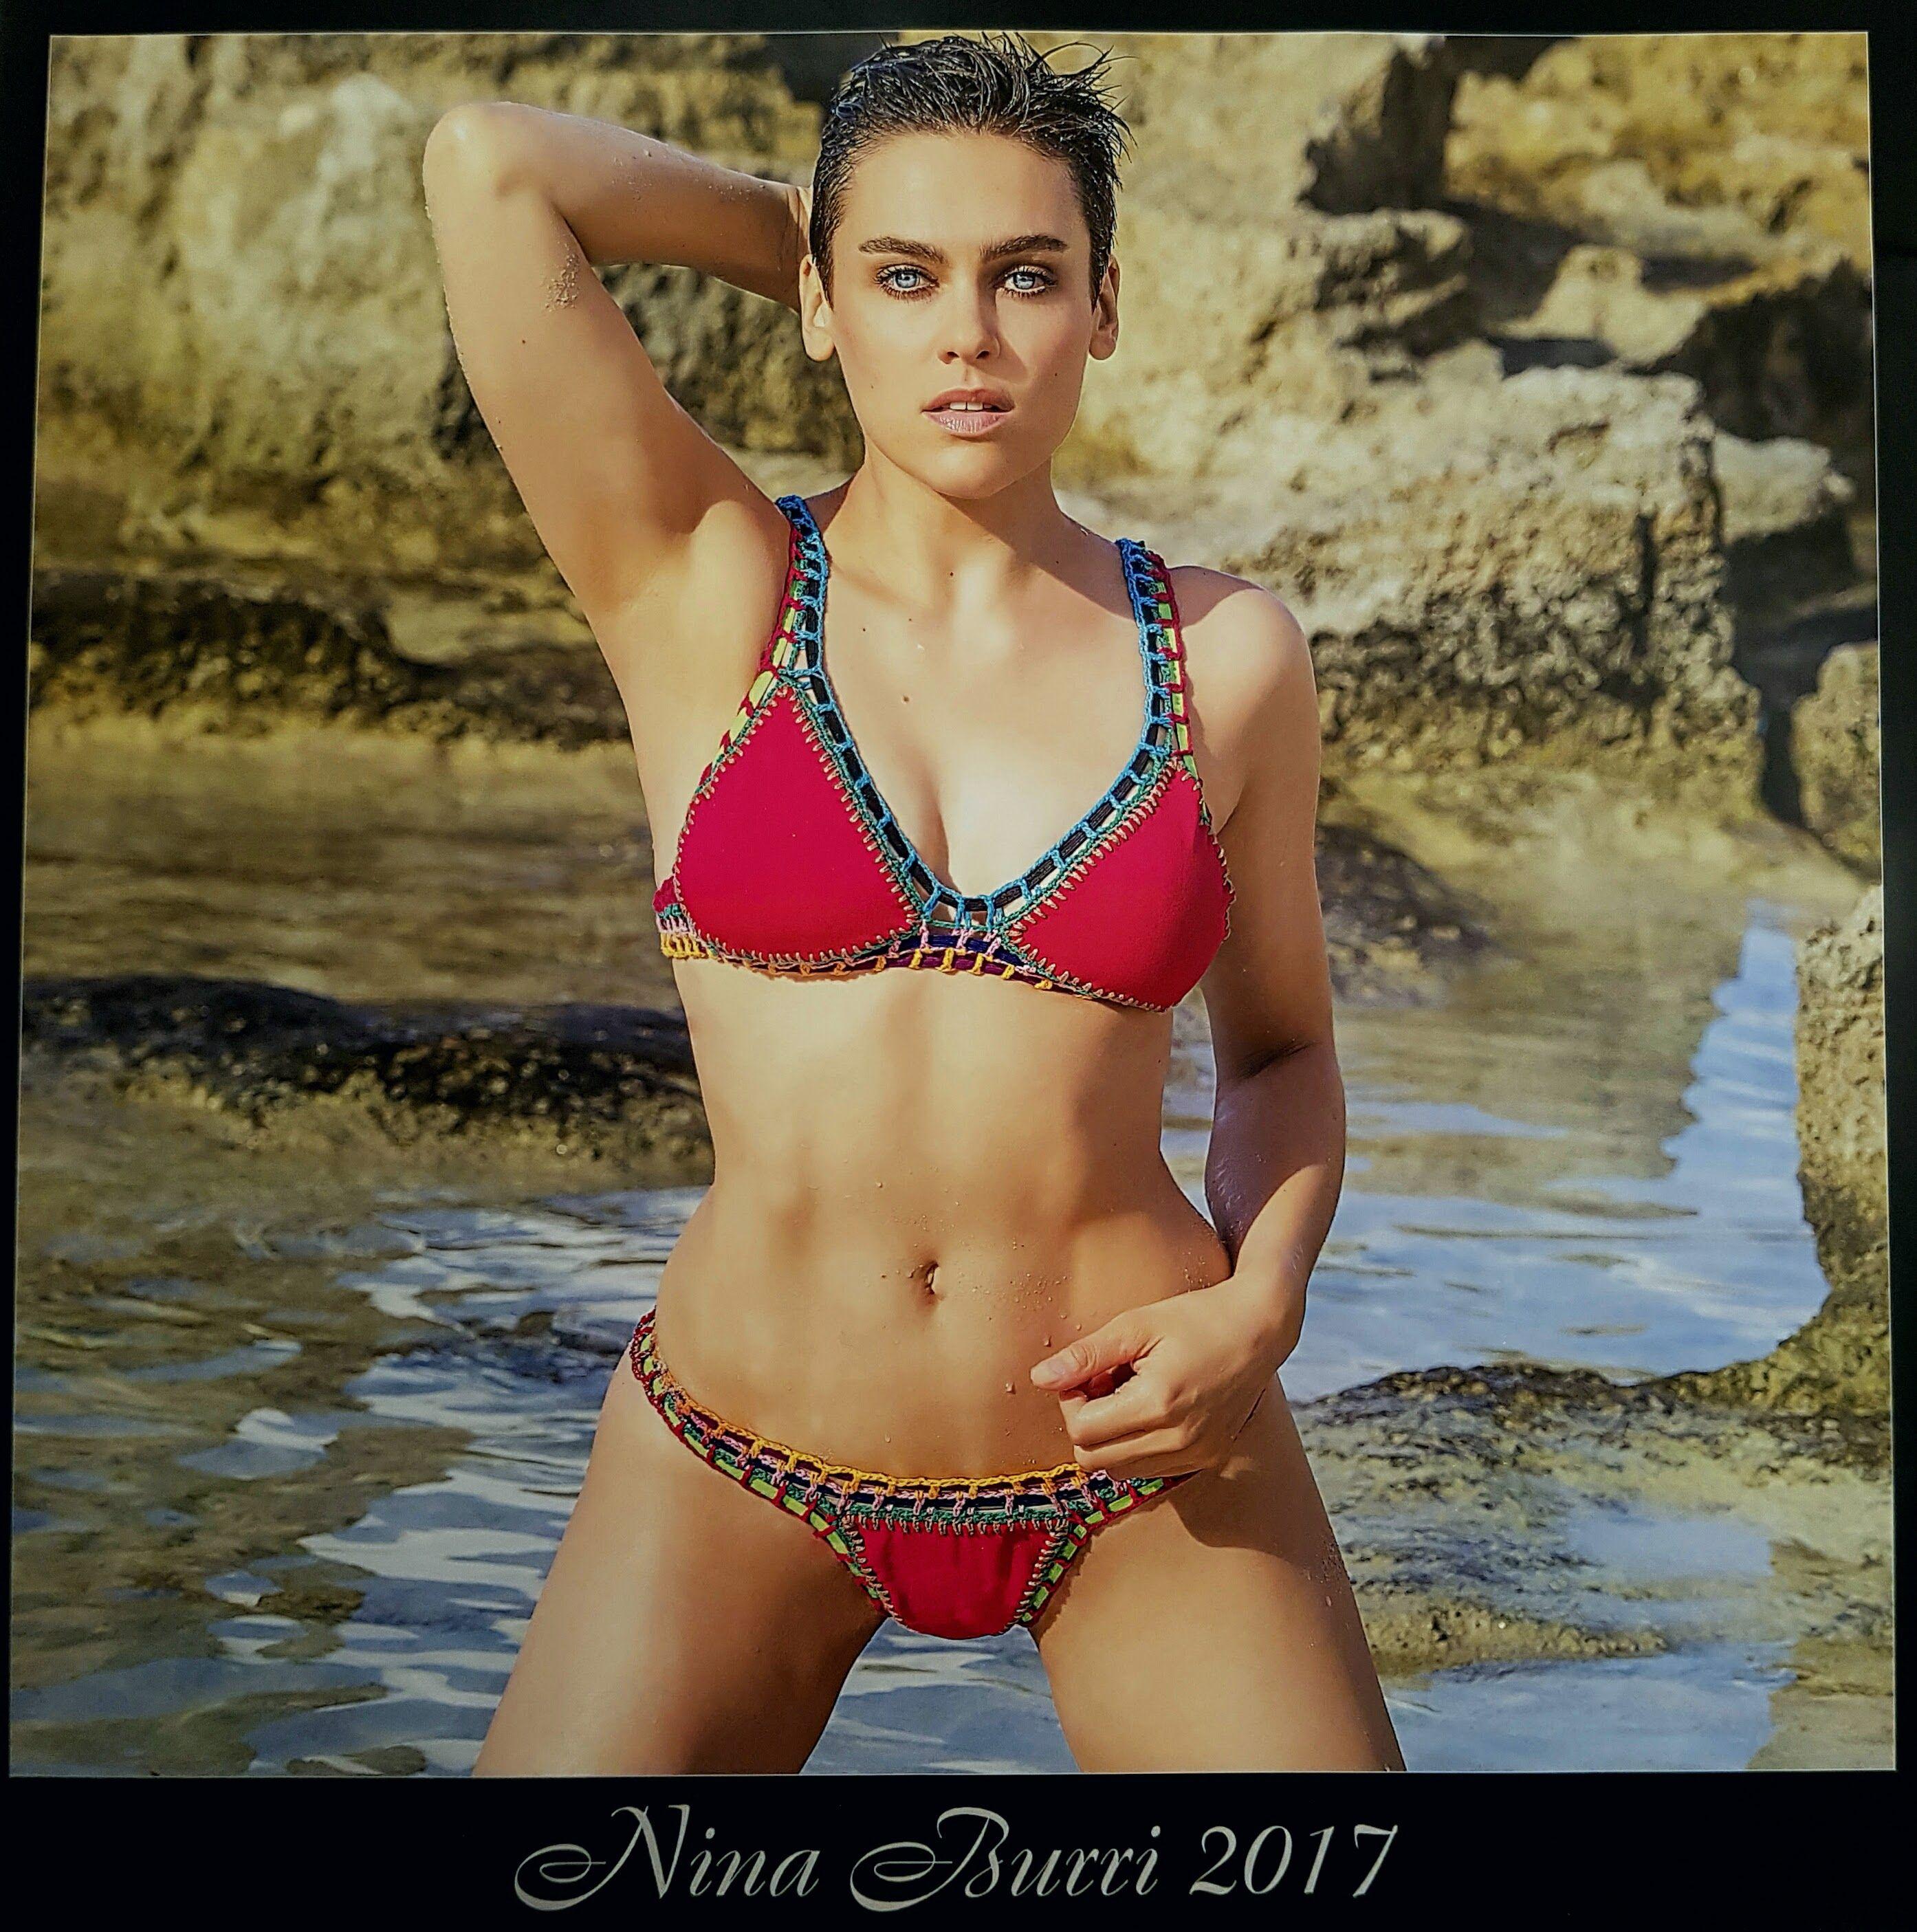 Selfie Nina Burri nudes (98 photo), Topless, Paparazzi, Selfie, in bikini 2019